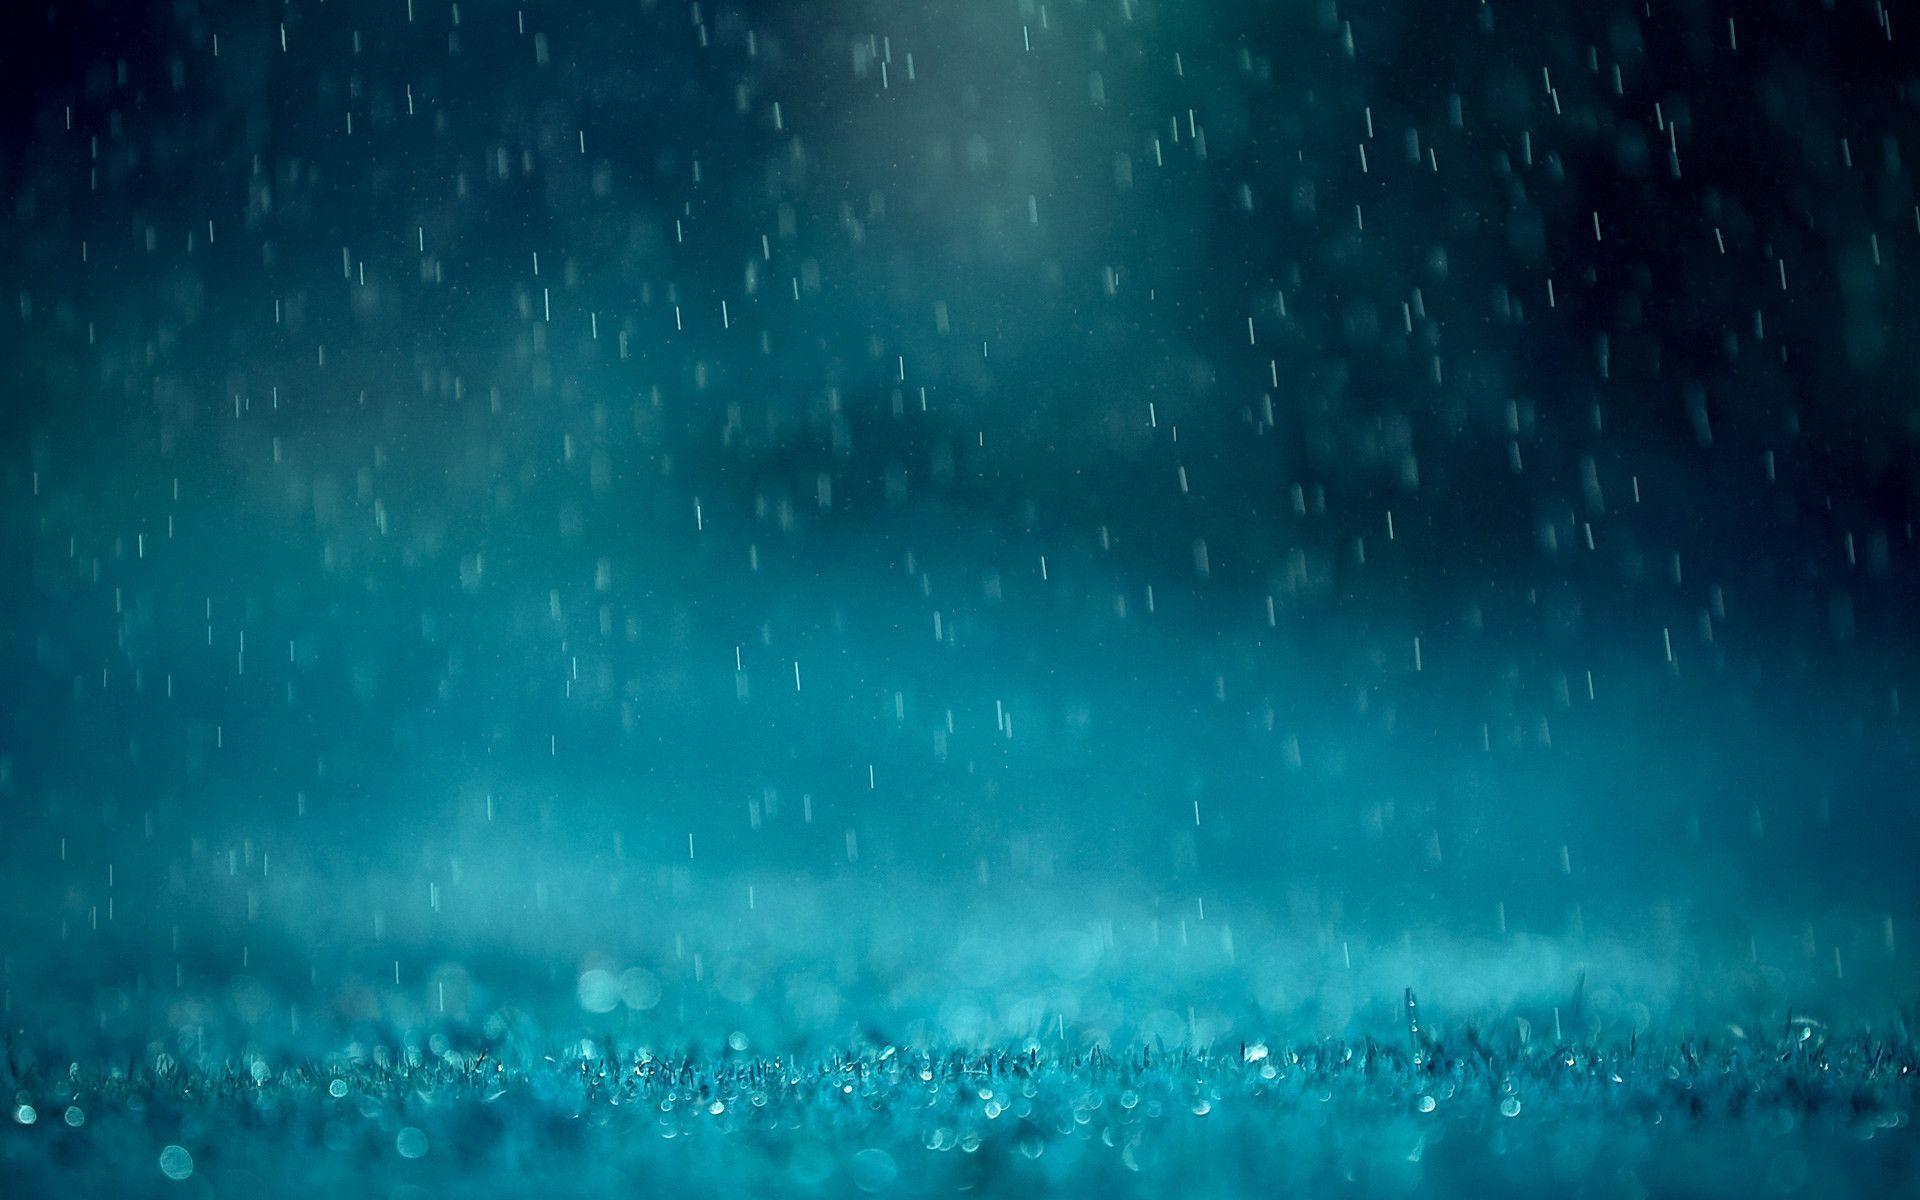 Beautiful-Rain-for-your-desktop-wallpaper-wpc5802683